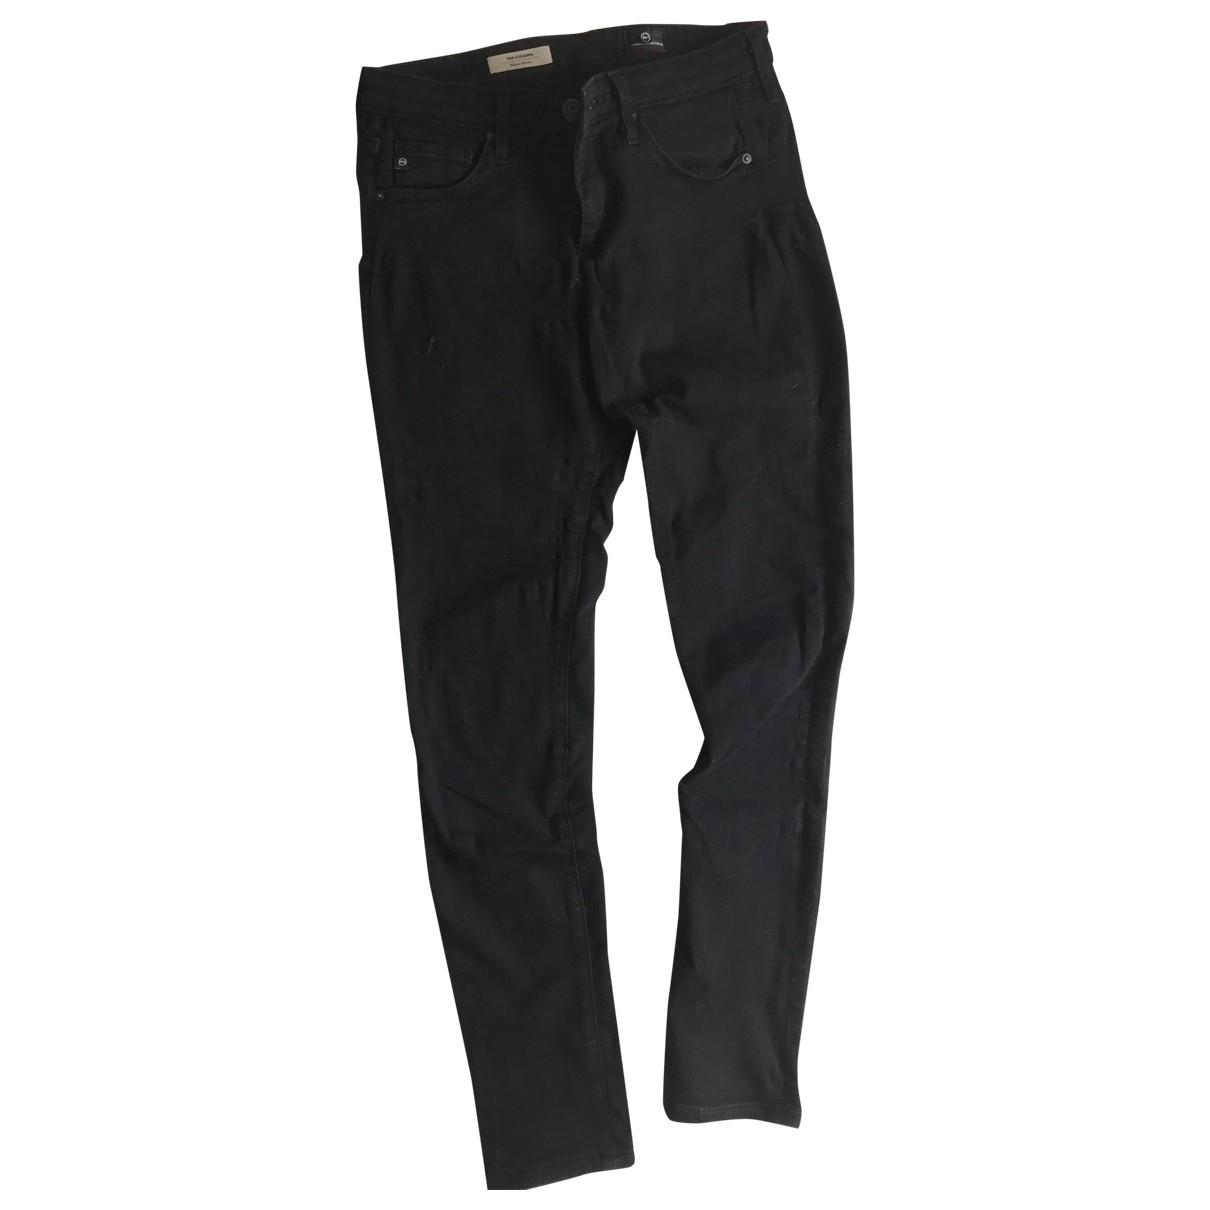 Ag Adriano Goldschmied \N Black Denim - Jeans Jeans for Women 26 US